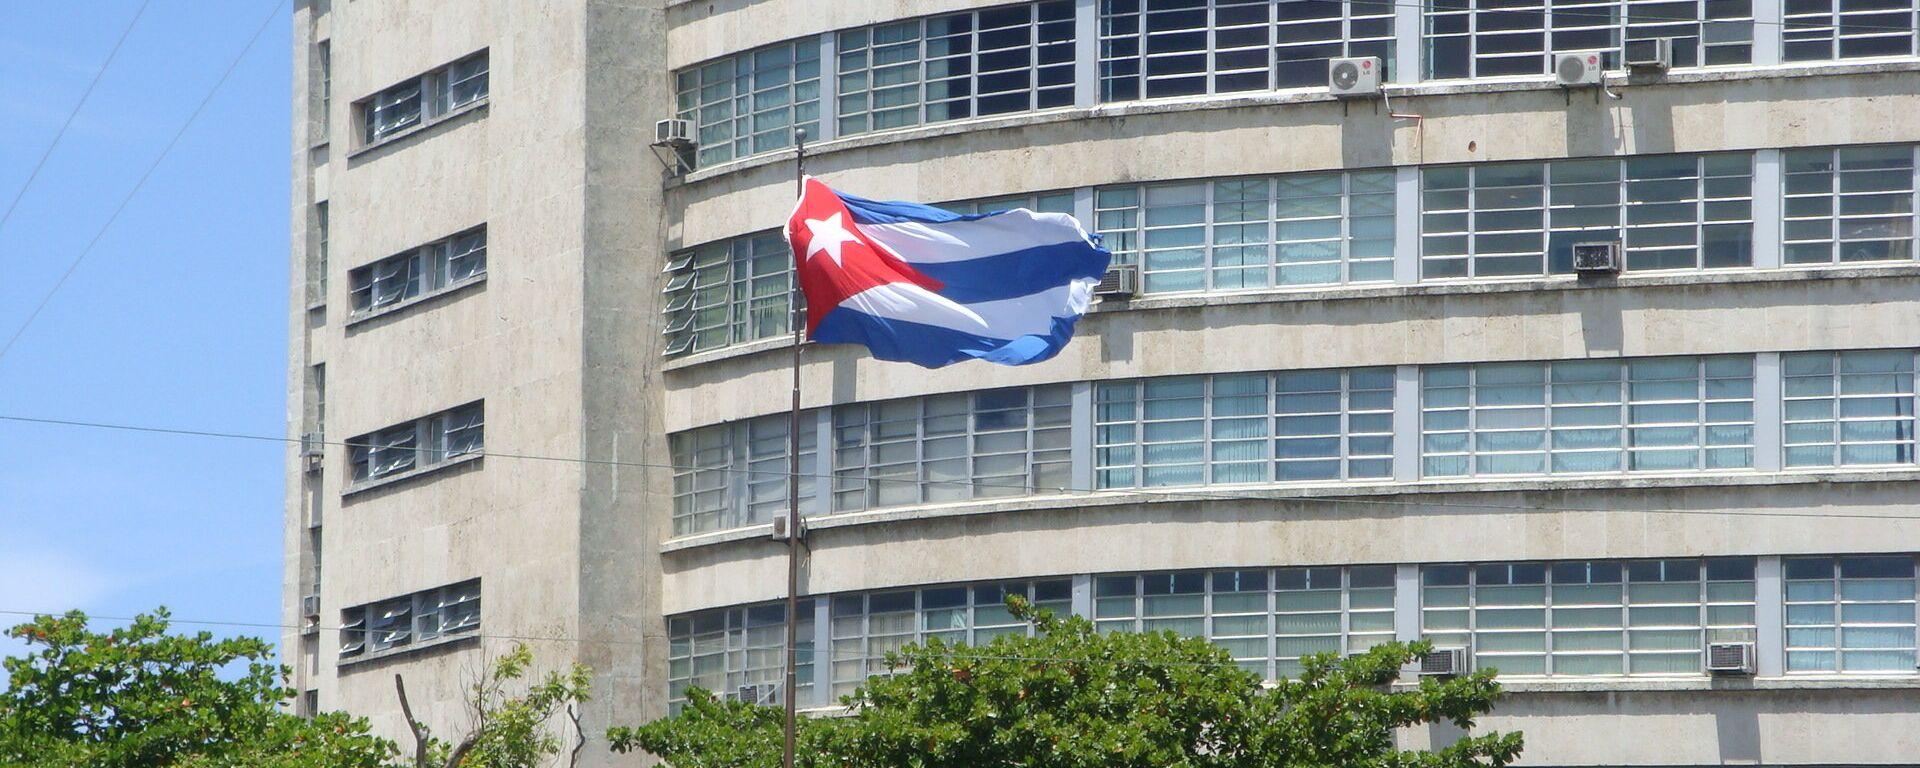 La bandiera cubana - Sputnik Italia, 1920, 07.08.2021